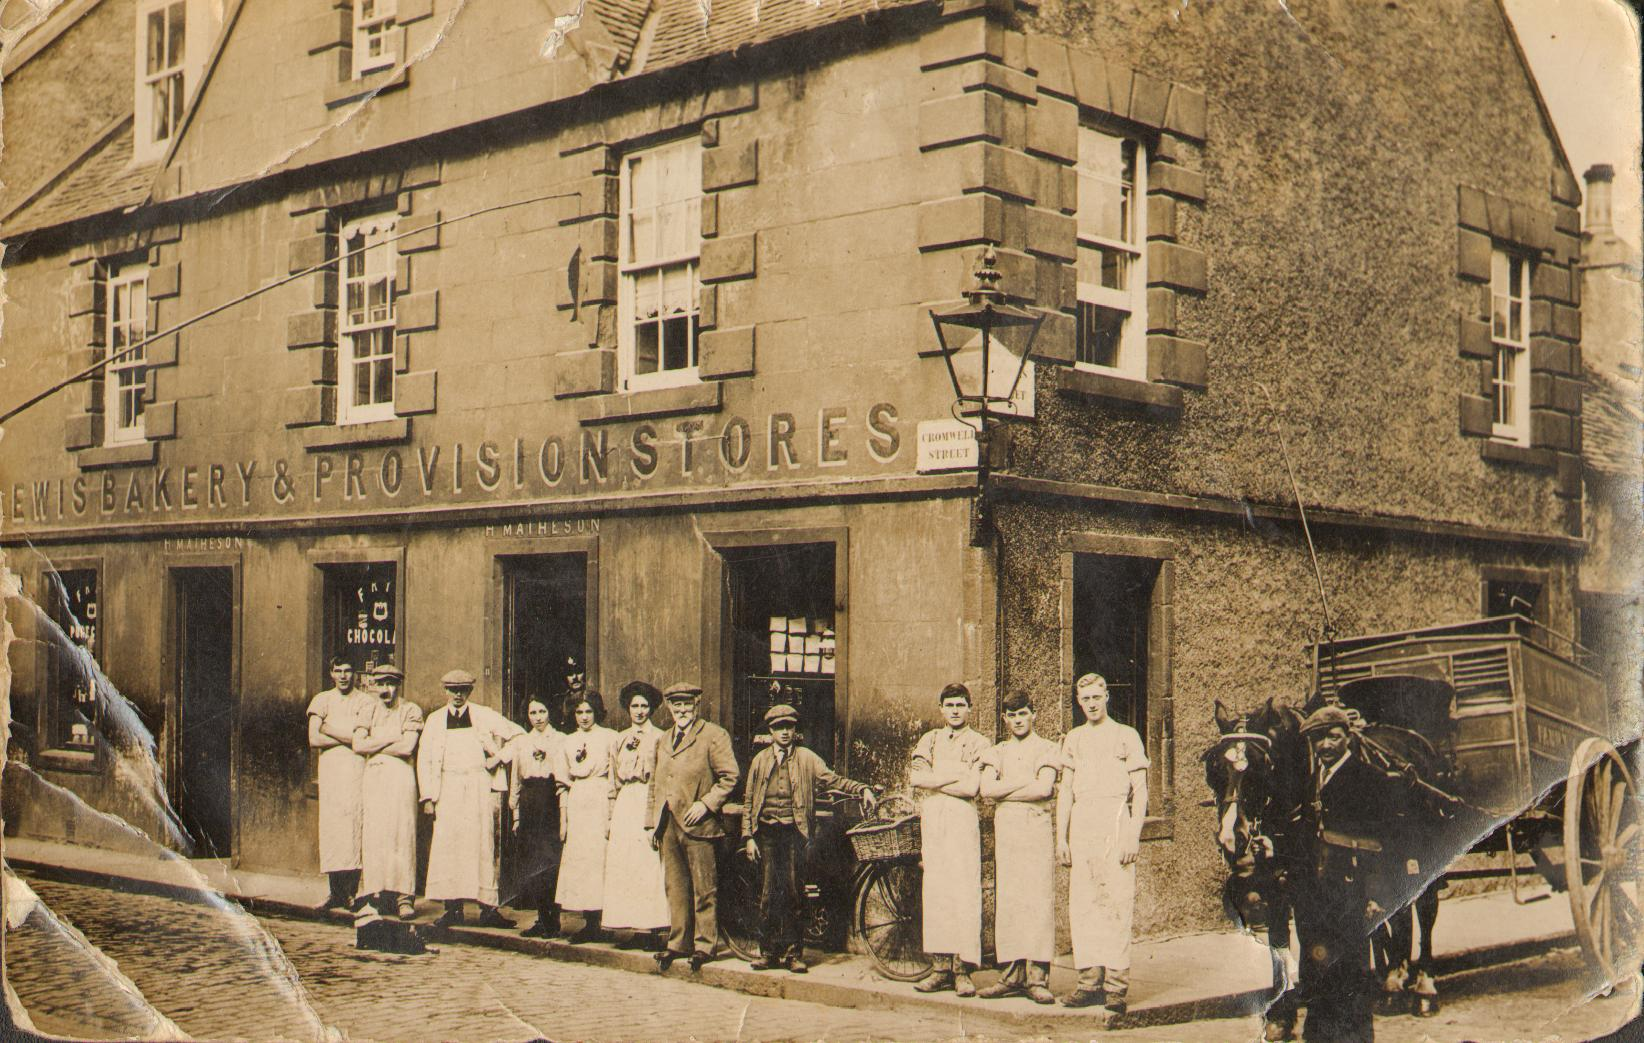 Lewis Bakery